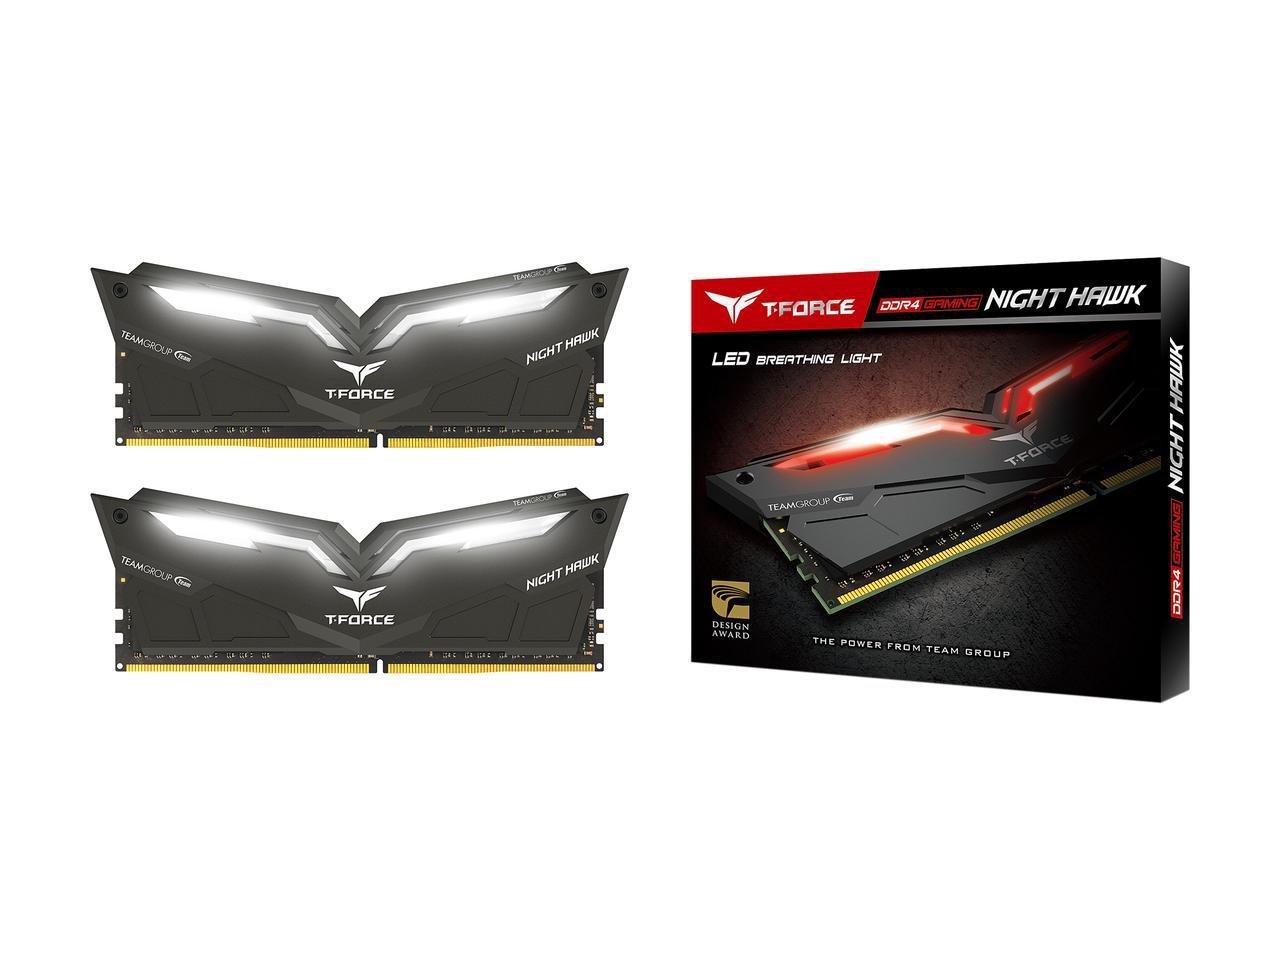 Team T-Force/Night Hawk 16GB (2 x 8GB) 288-Pin DDR4 SDRAM DDR4 3000 (PC4 24000) Memory Model THWD416G3000HC16CDC01